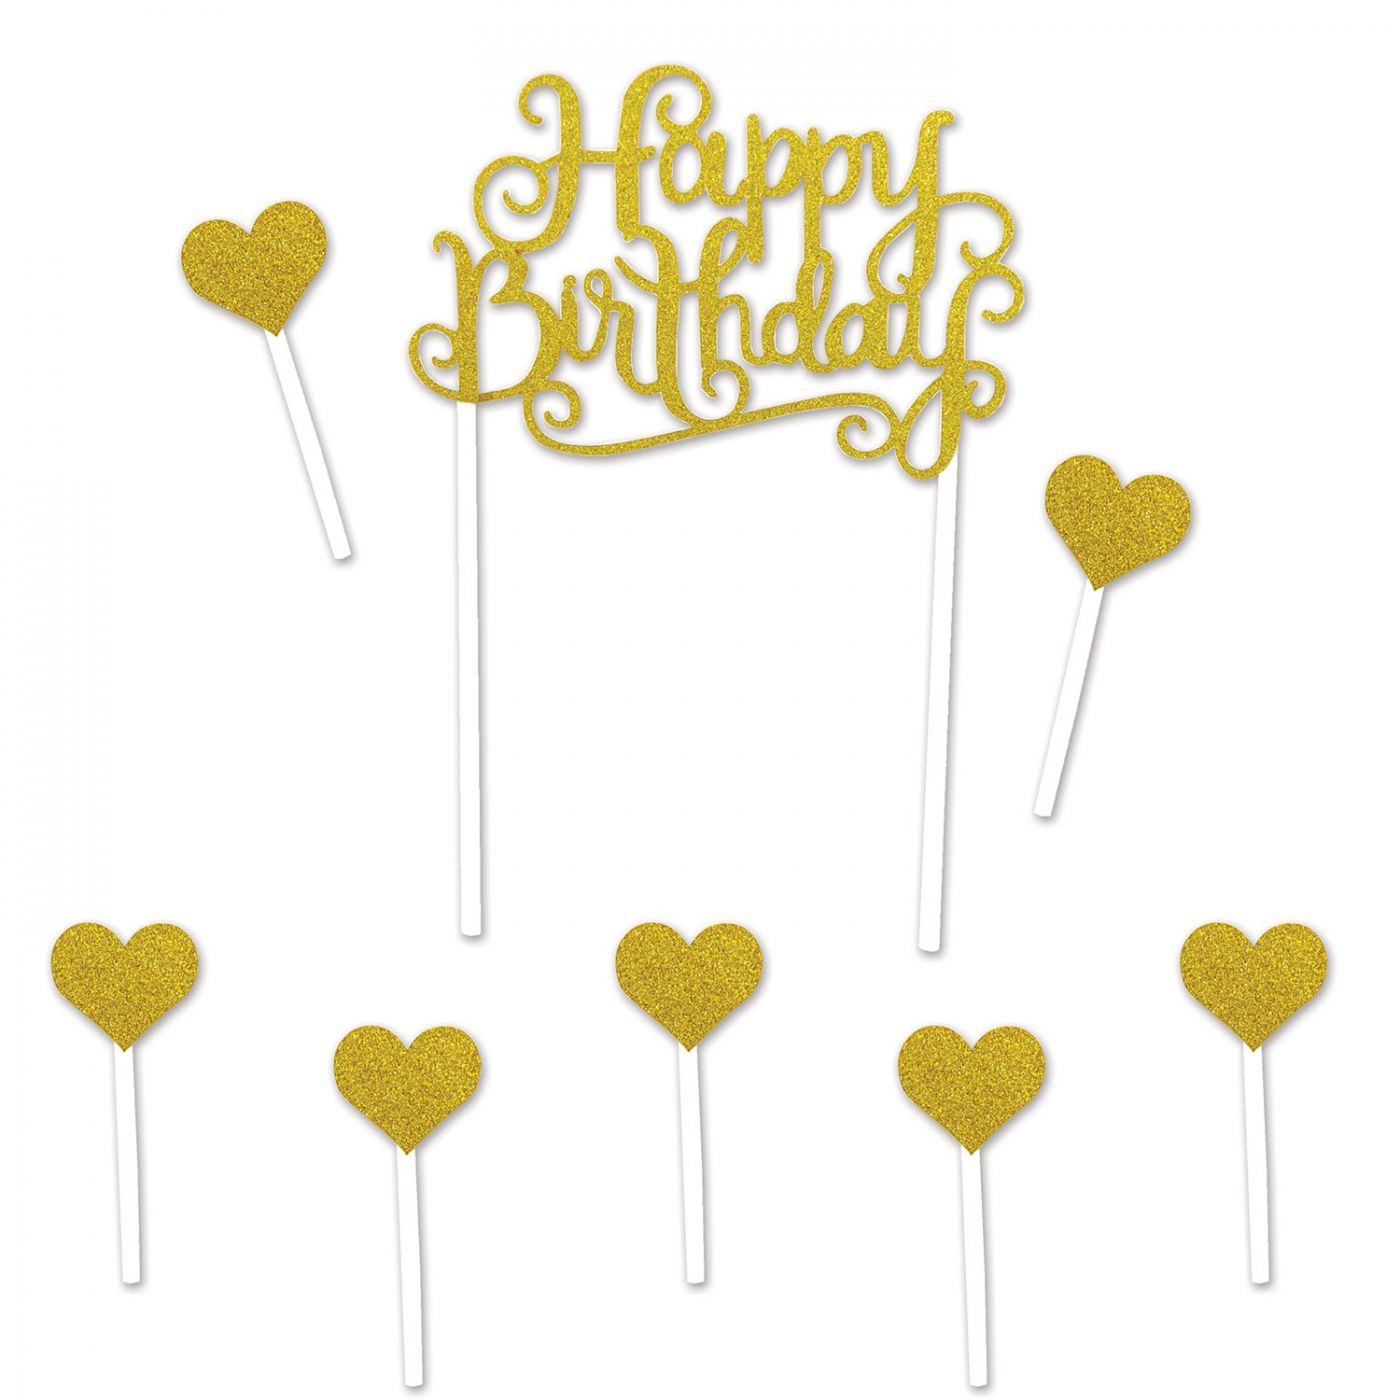 Image of Happy Birthday Cake Topper